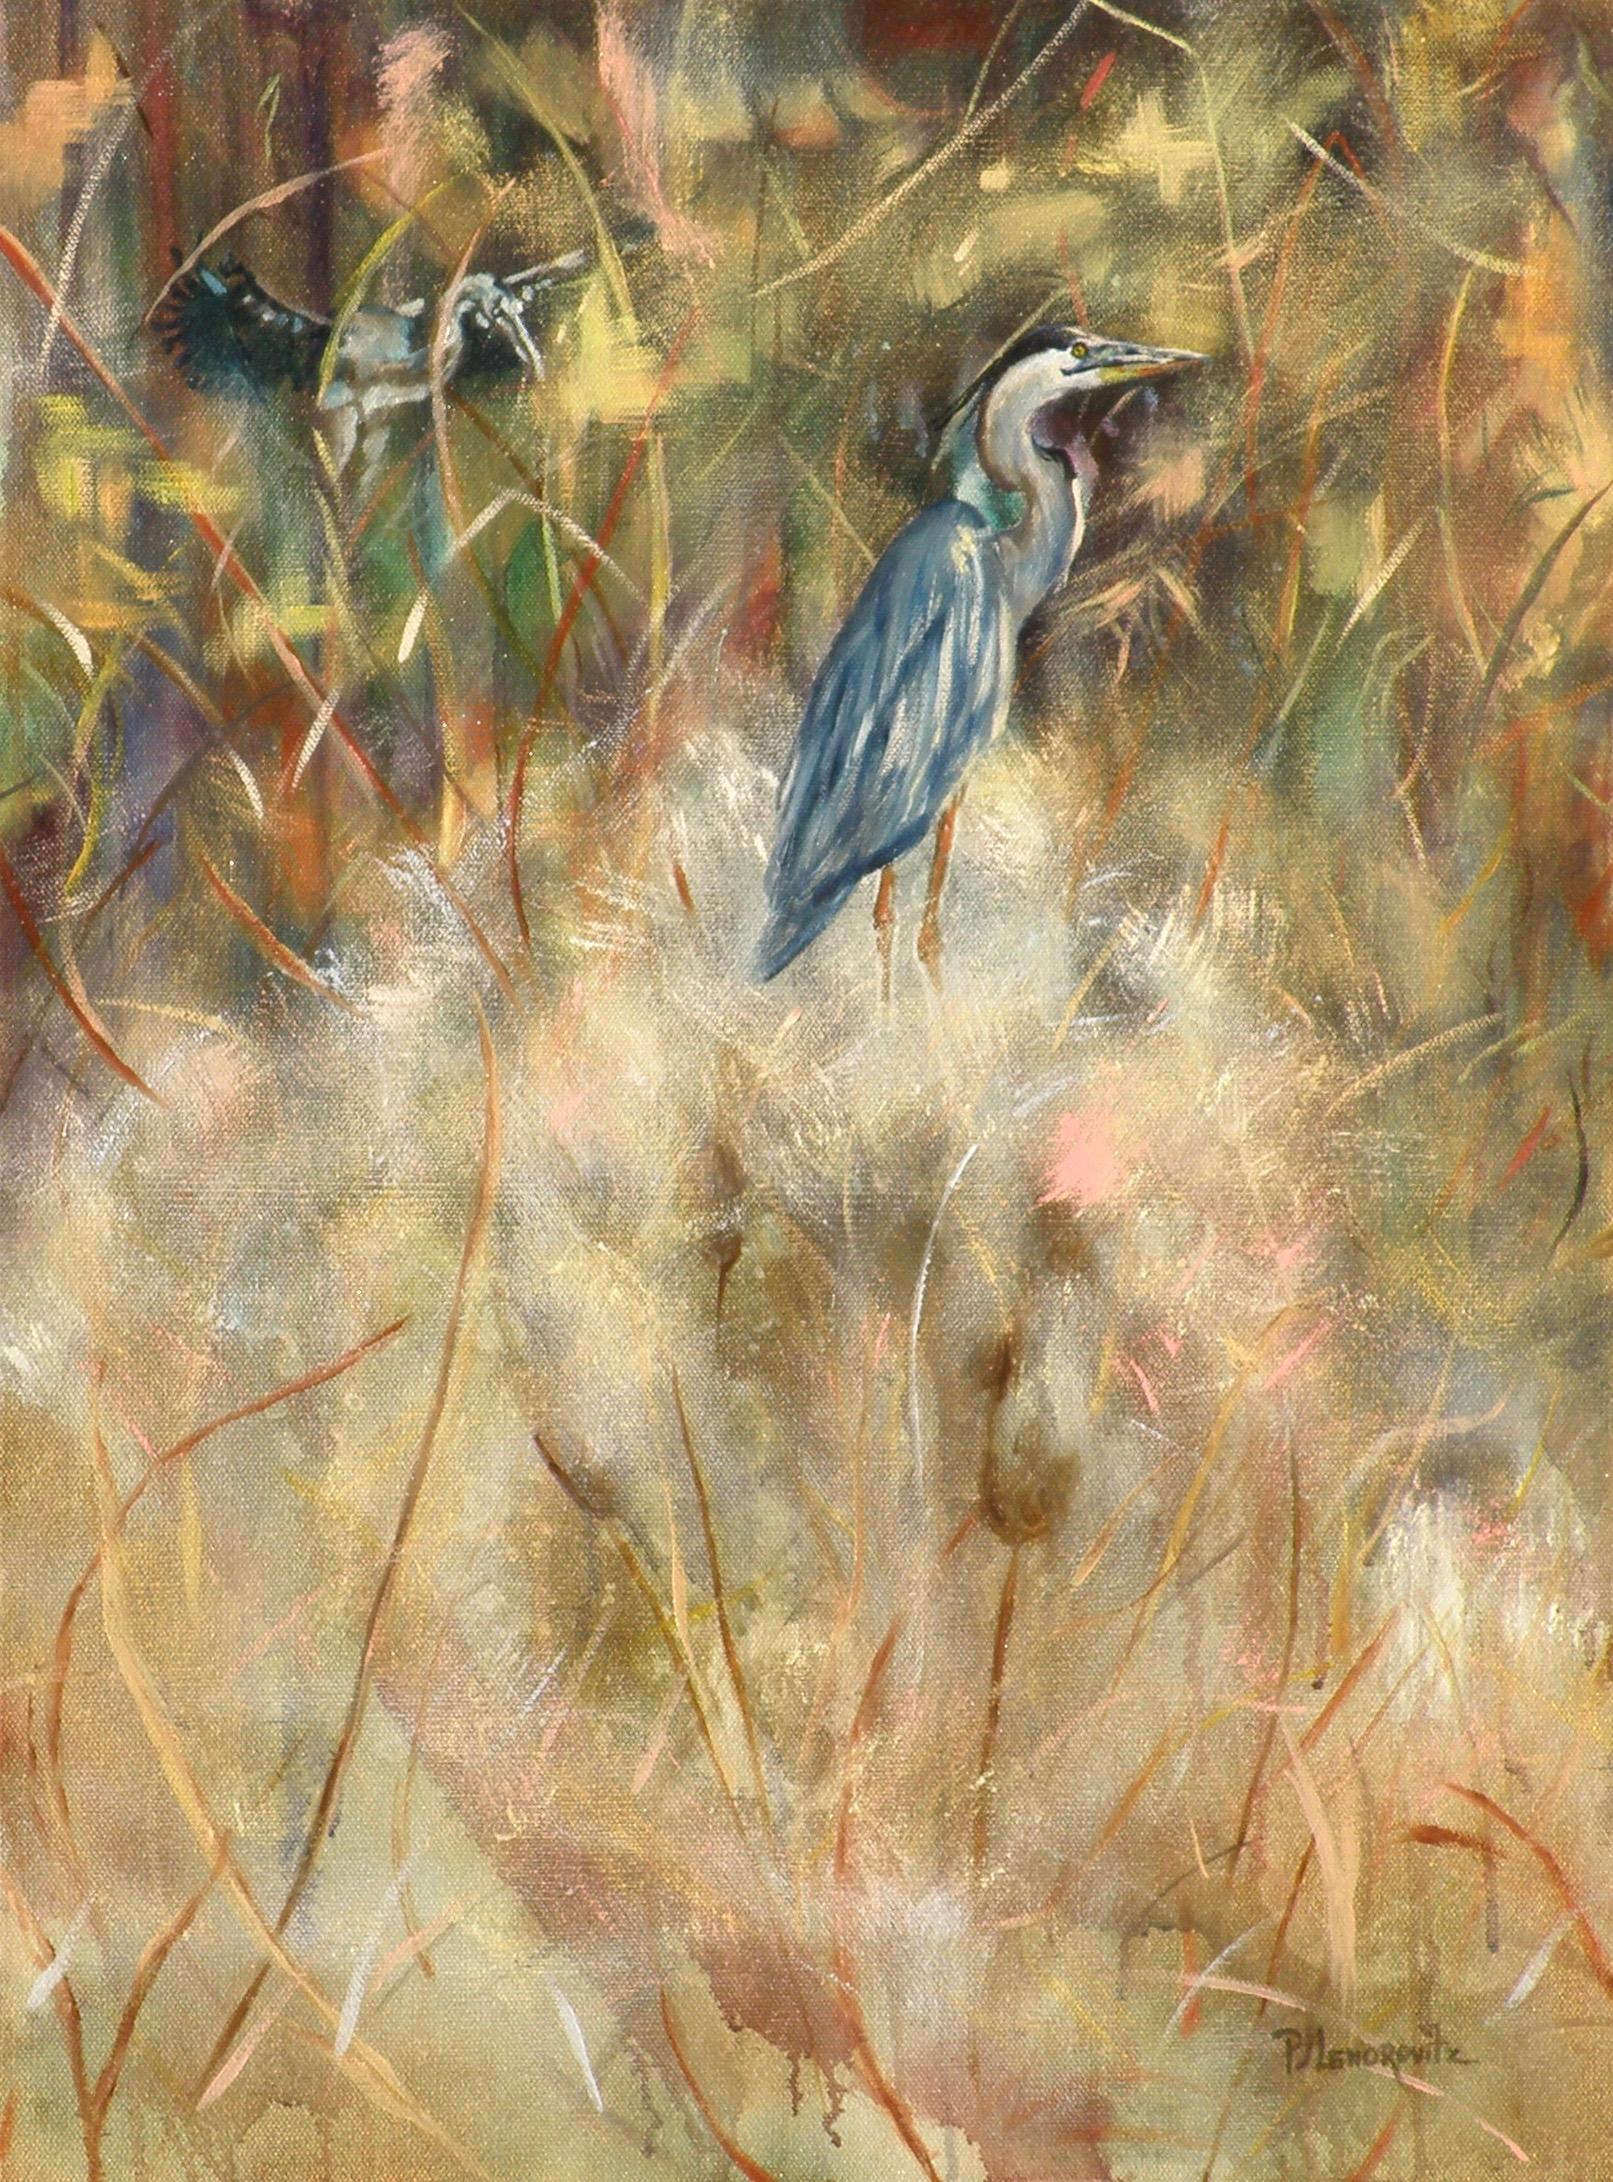 Blue Heron Dusk